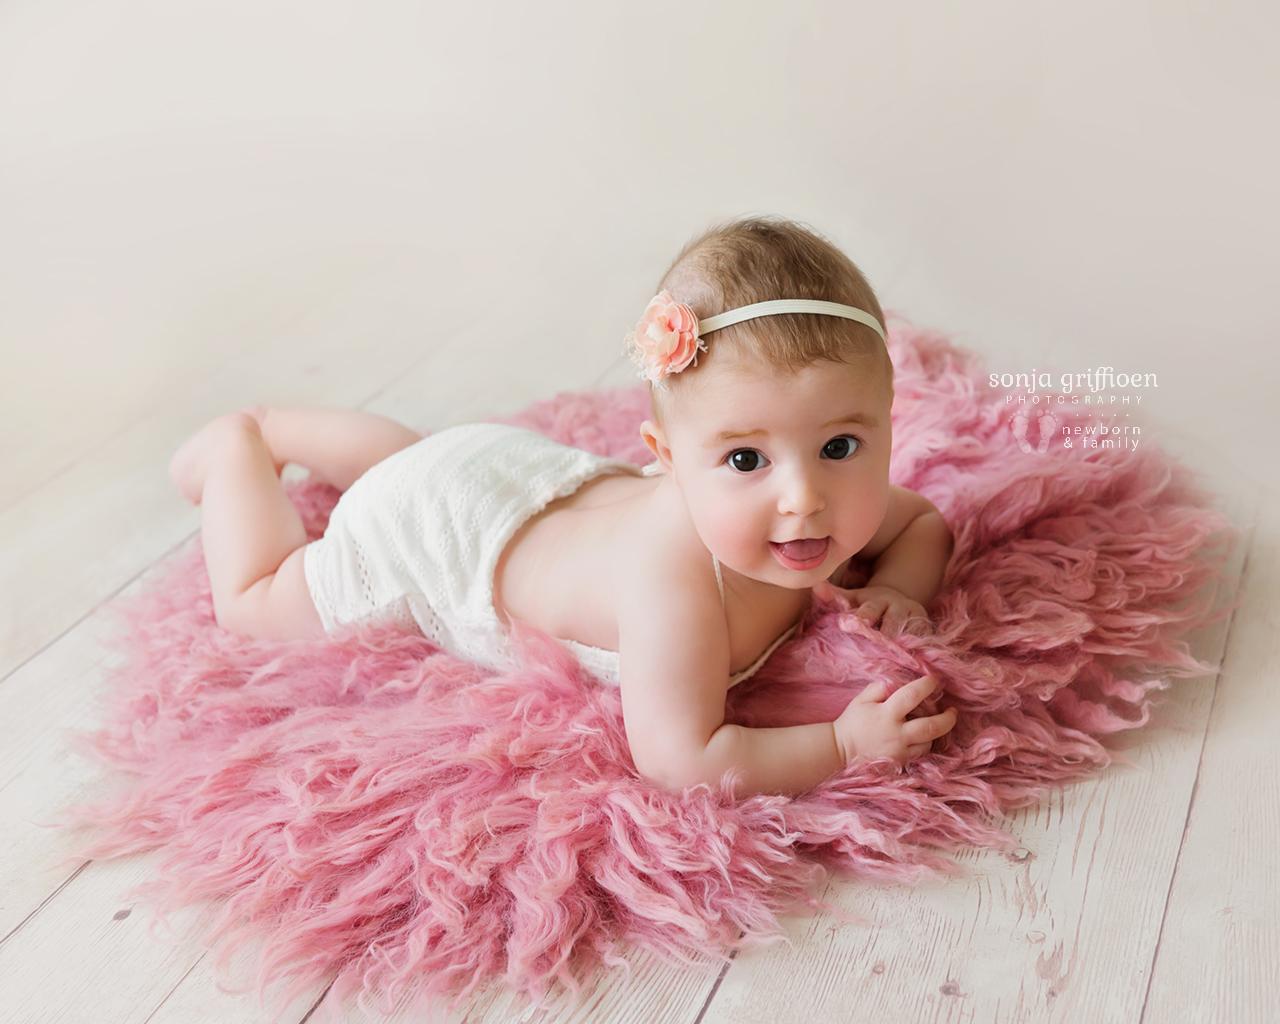 Everlyn-Milestone-Brisbane-Baby-Photography-Sonja-Griffioen-17.jpg